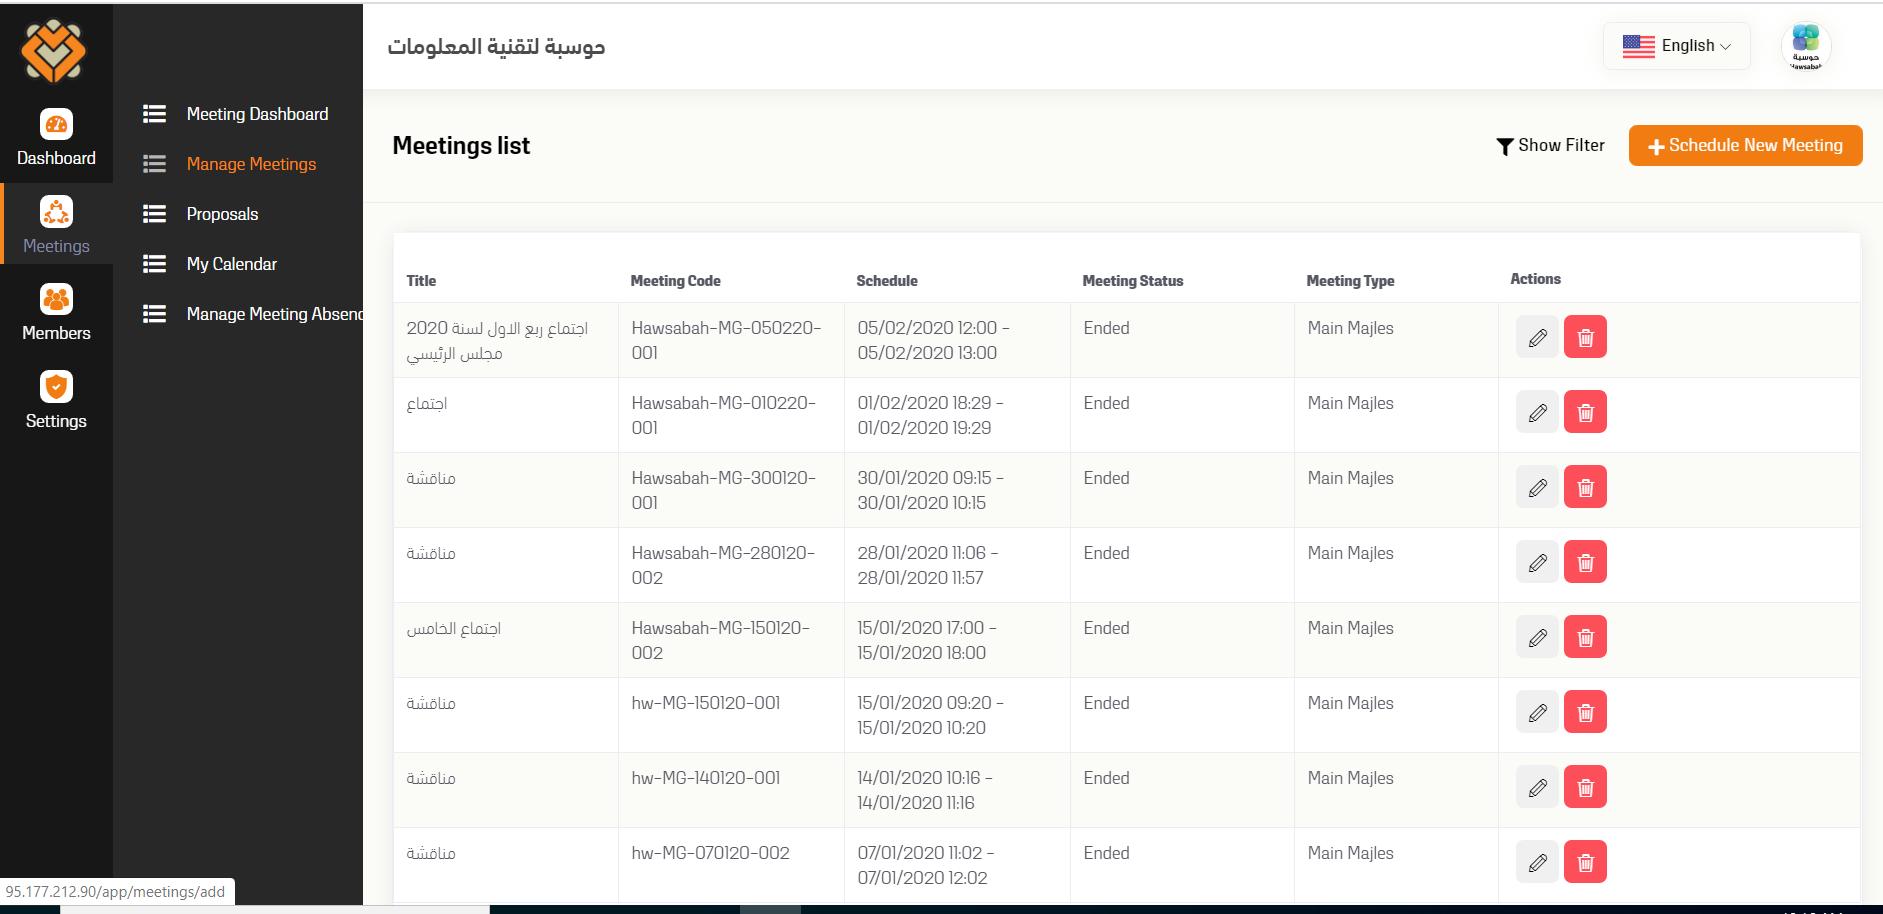 Mjlsi meeting information screenshot